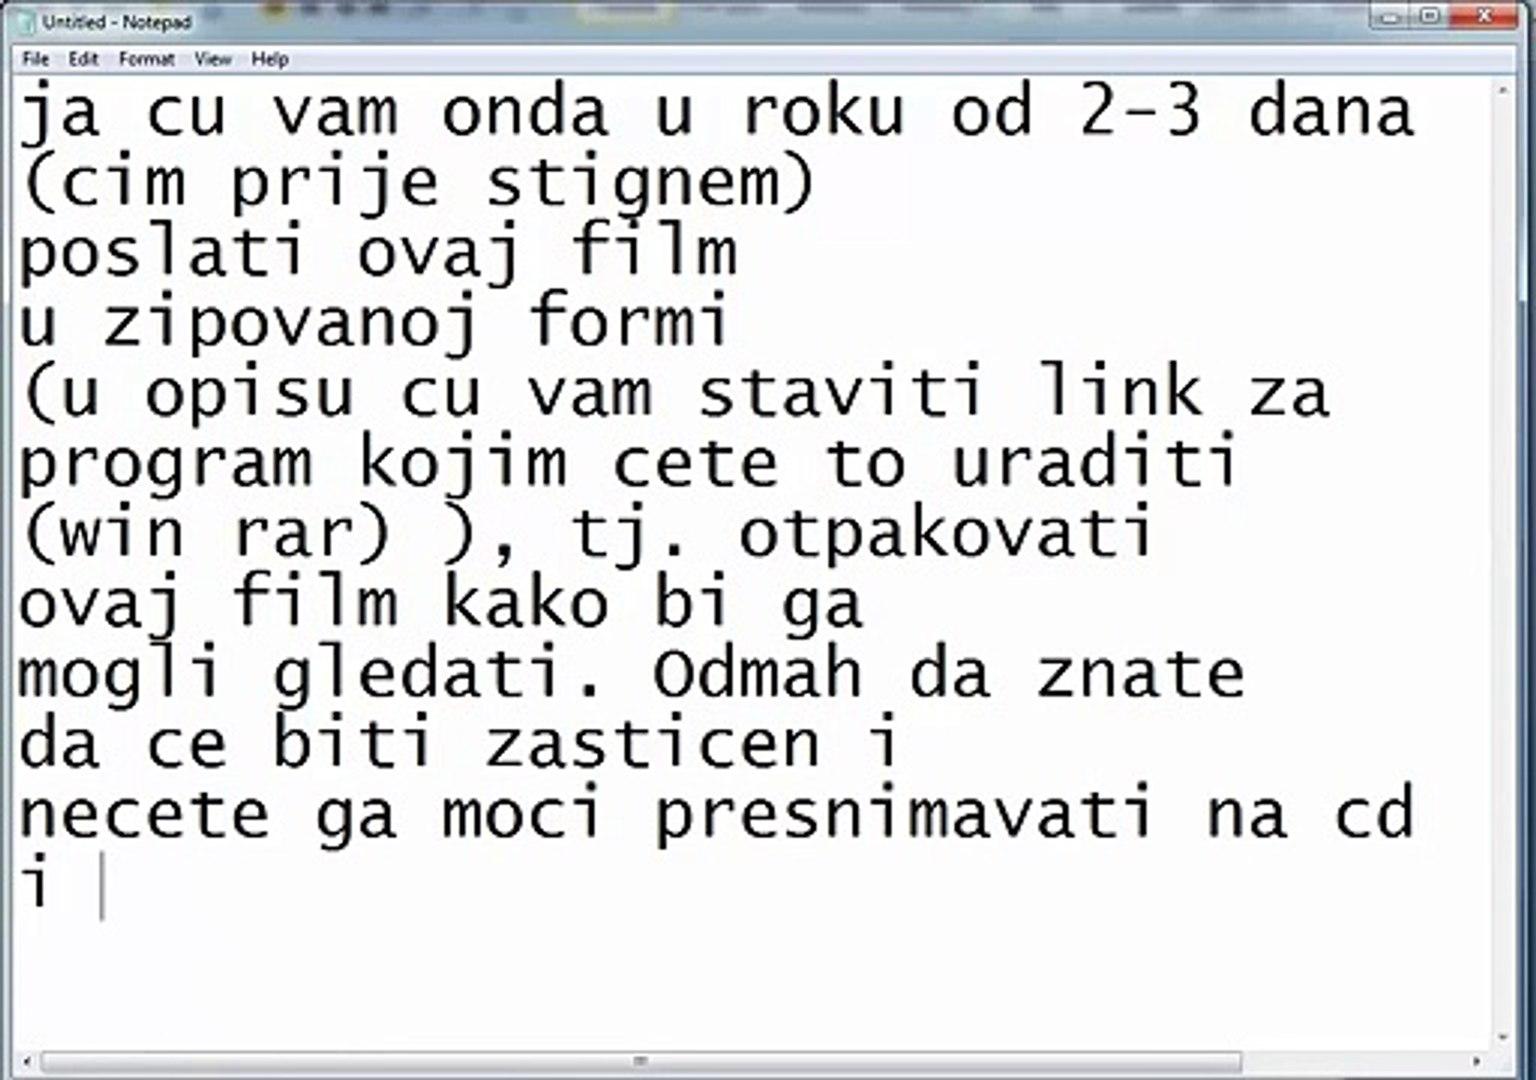 Online mraz film kao rani Kao rani